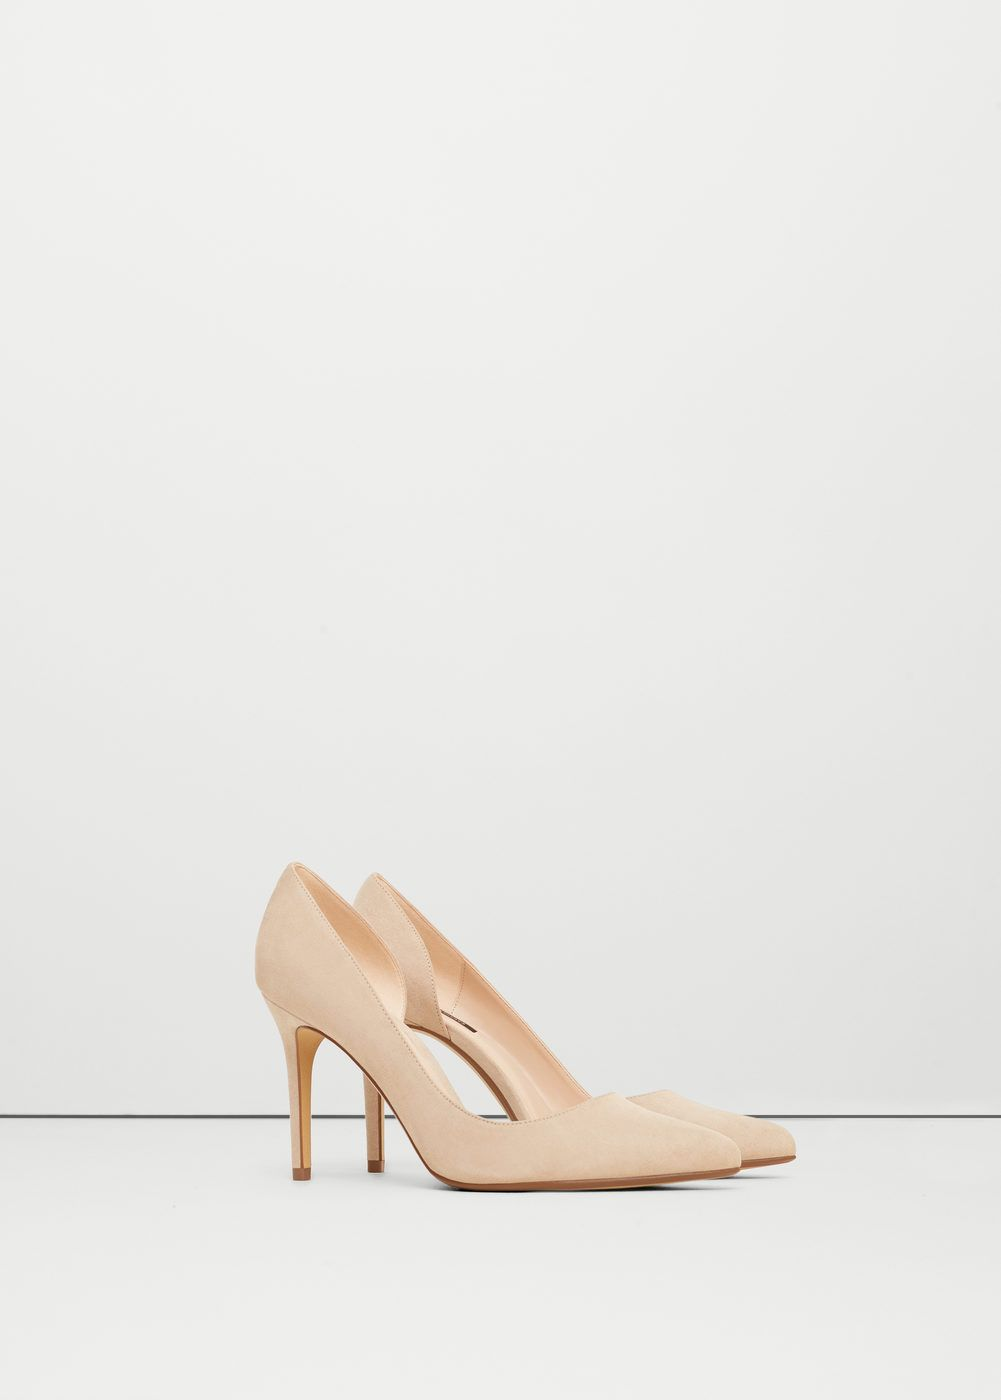 Zapato salón - Zapatos de Mujer  c68819ca0aac